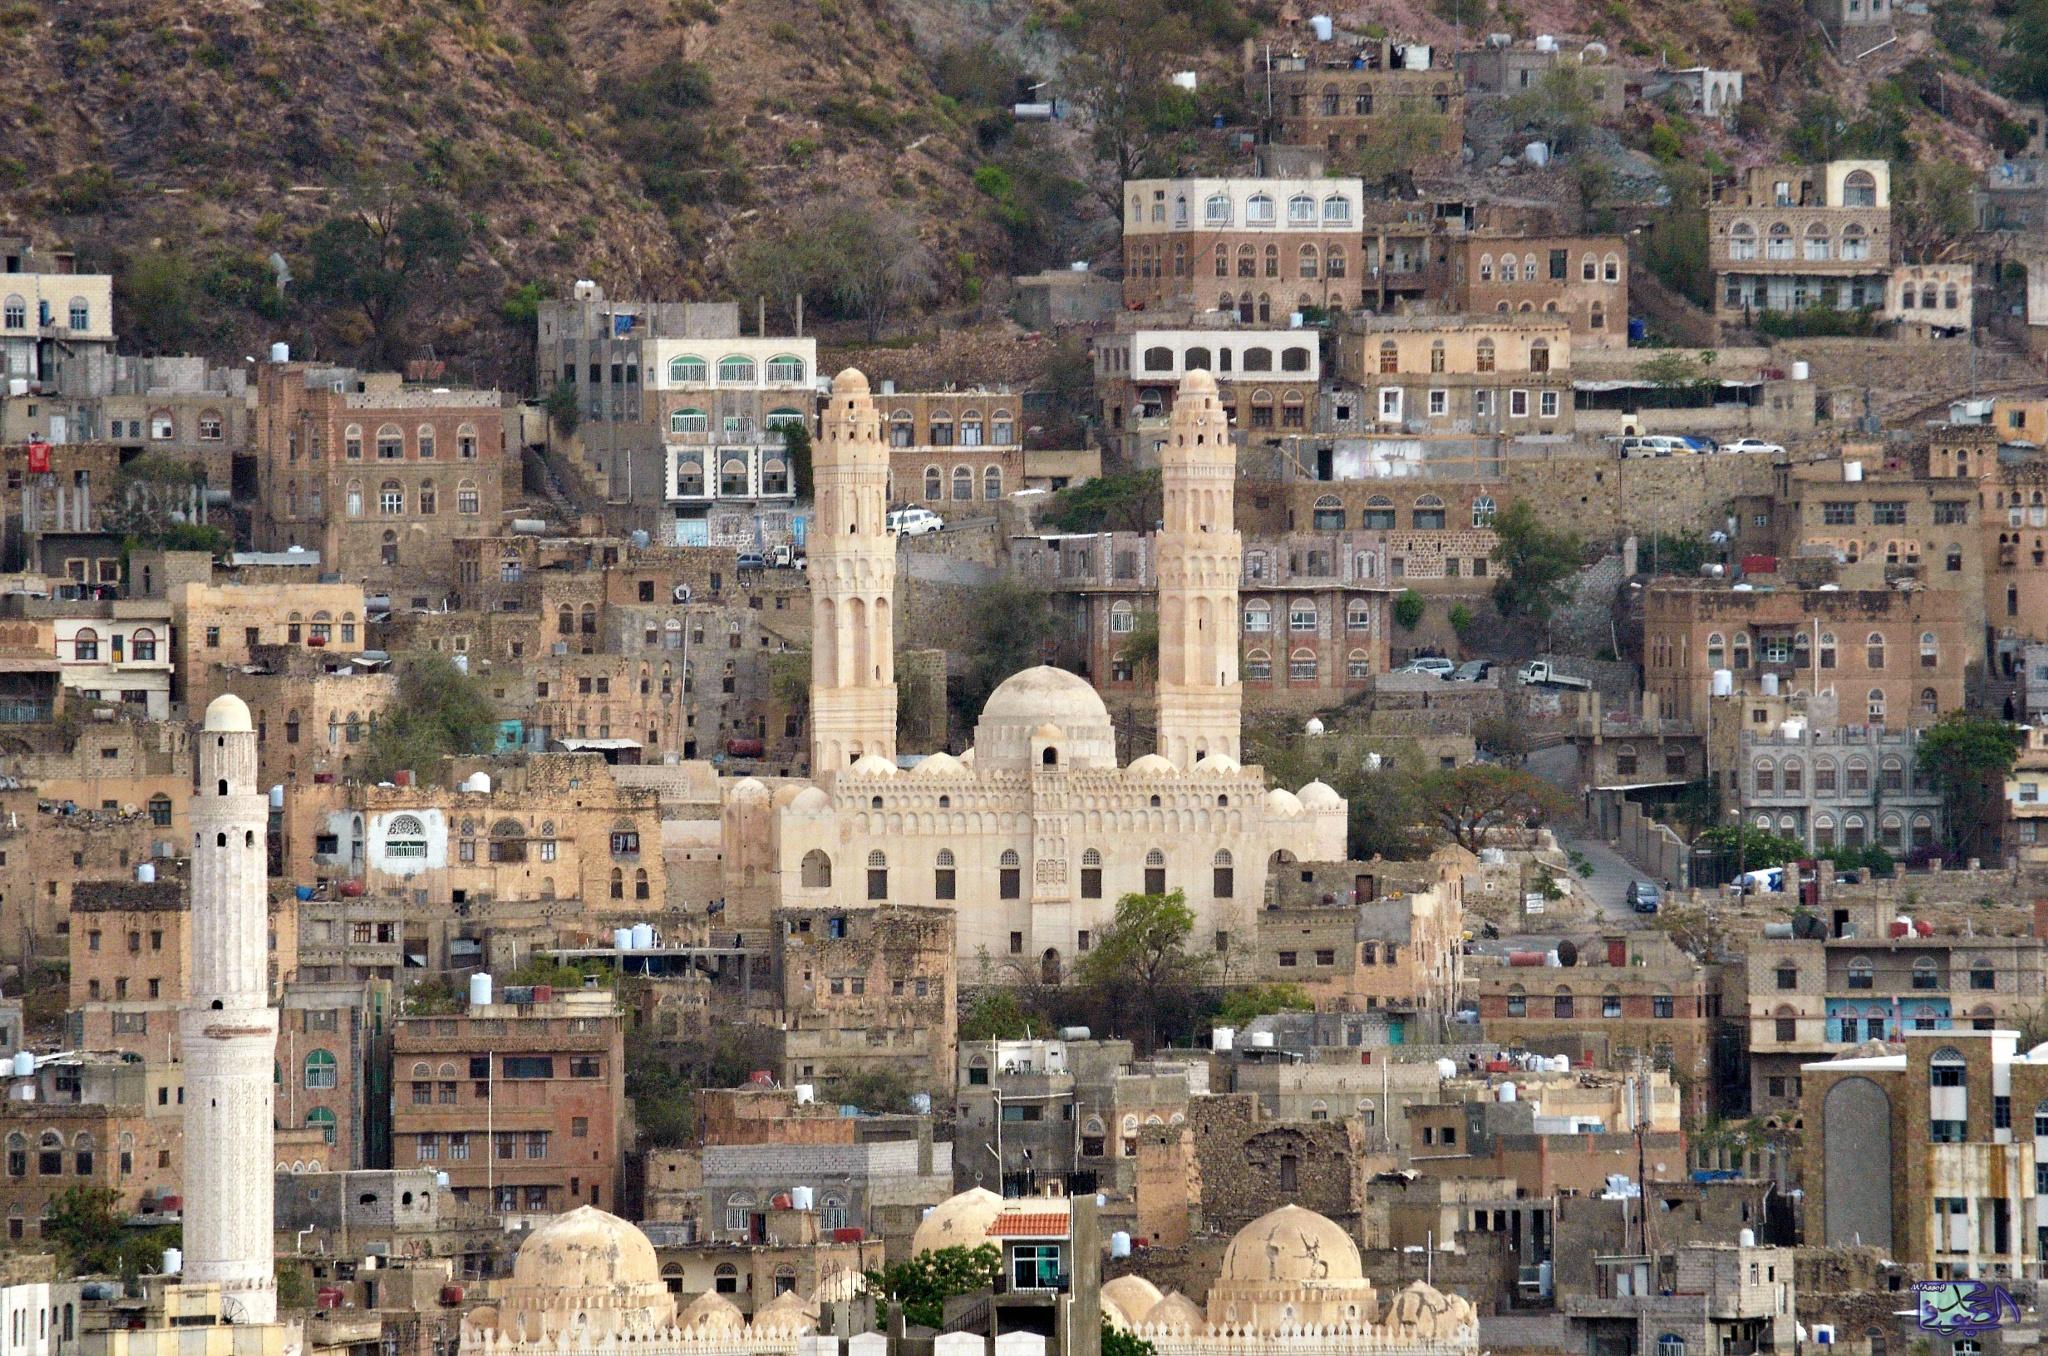 Old City, Taiz, Yemen by massofi